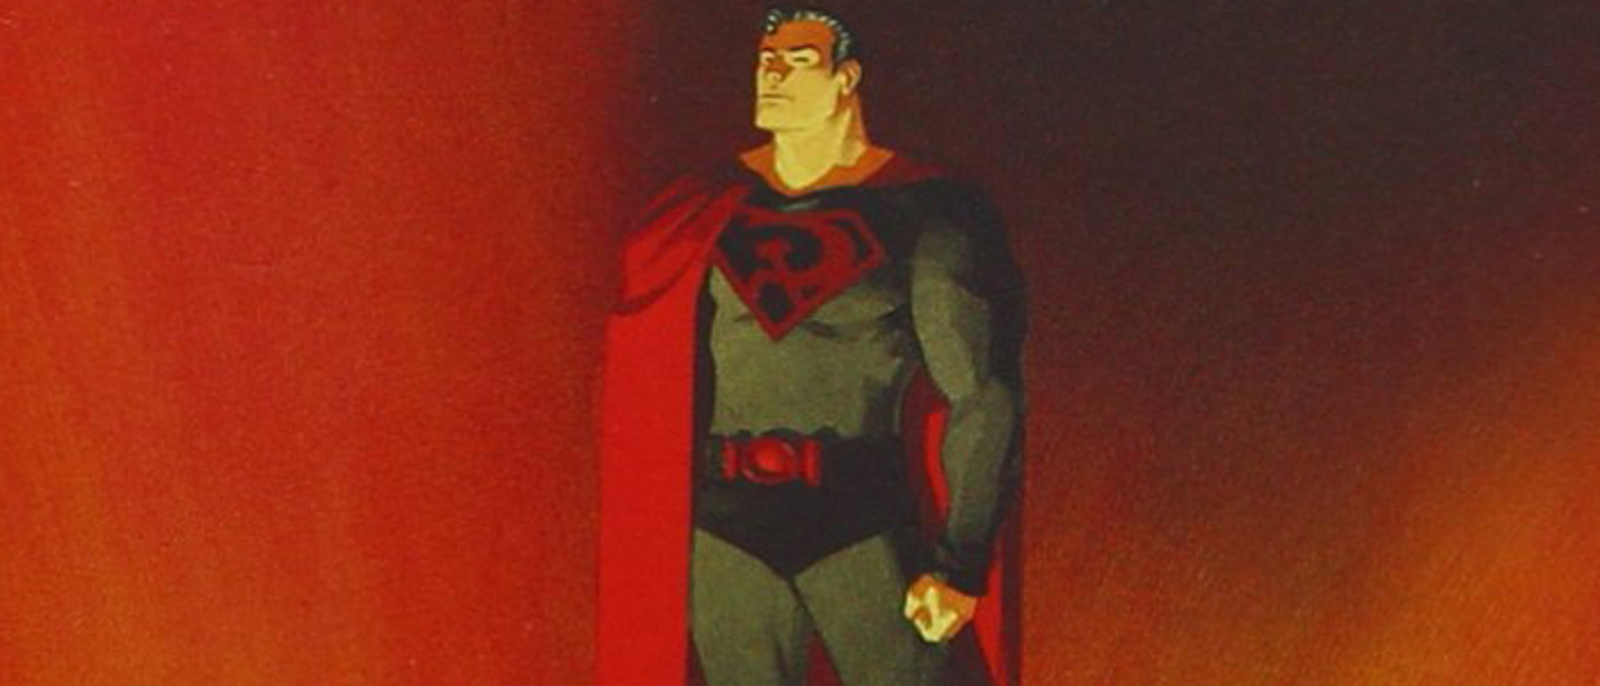 Американцы снимут фильм про советского супермена